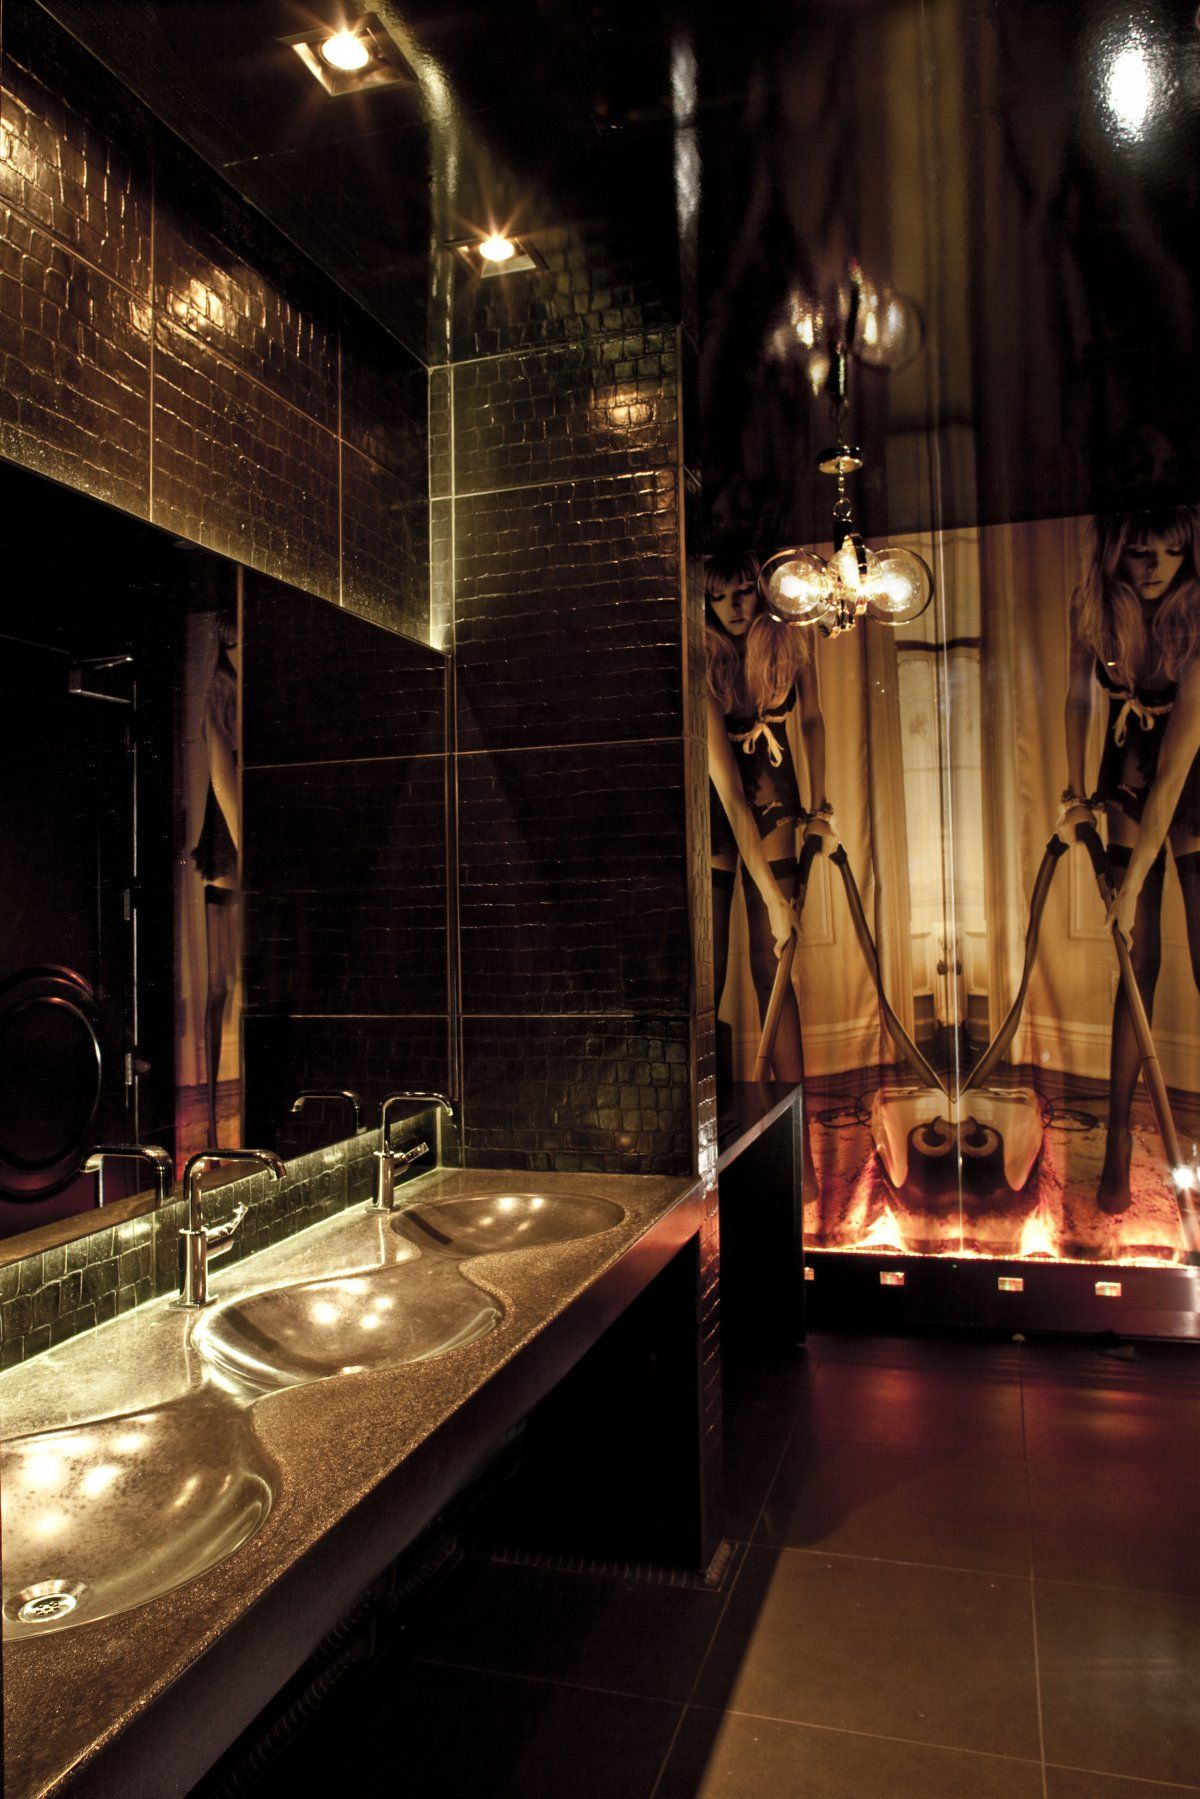 Bathroom Design Las Vegas the 10 best public bathrooms in america | flat screen, vanities